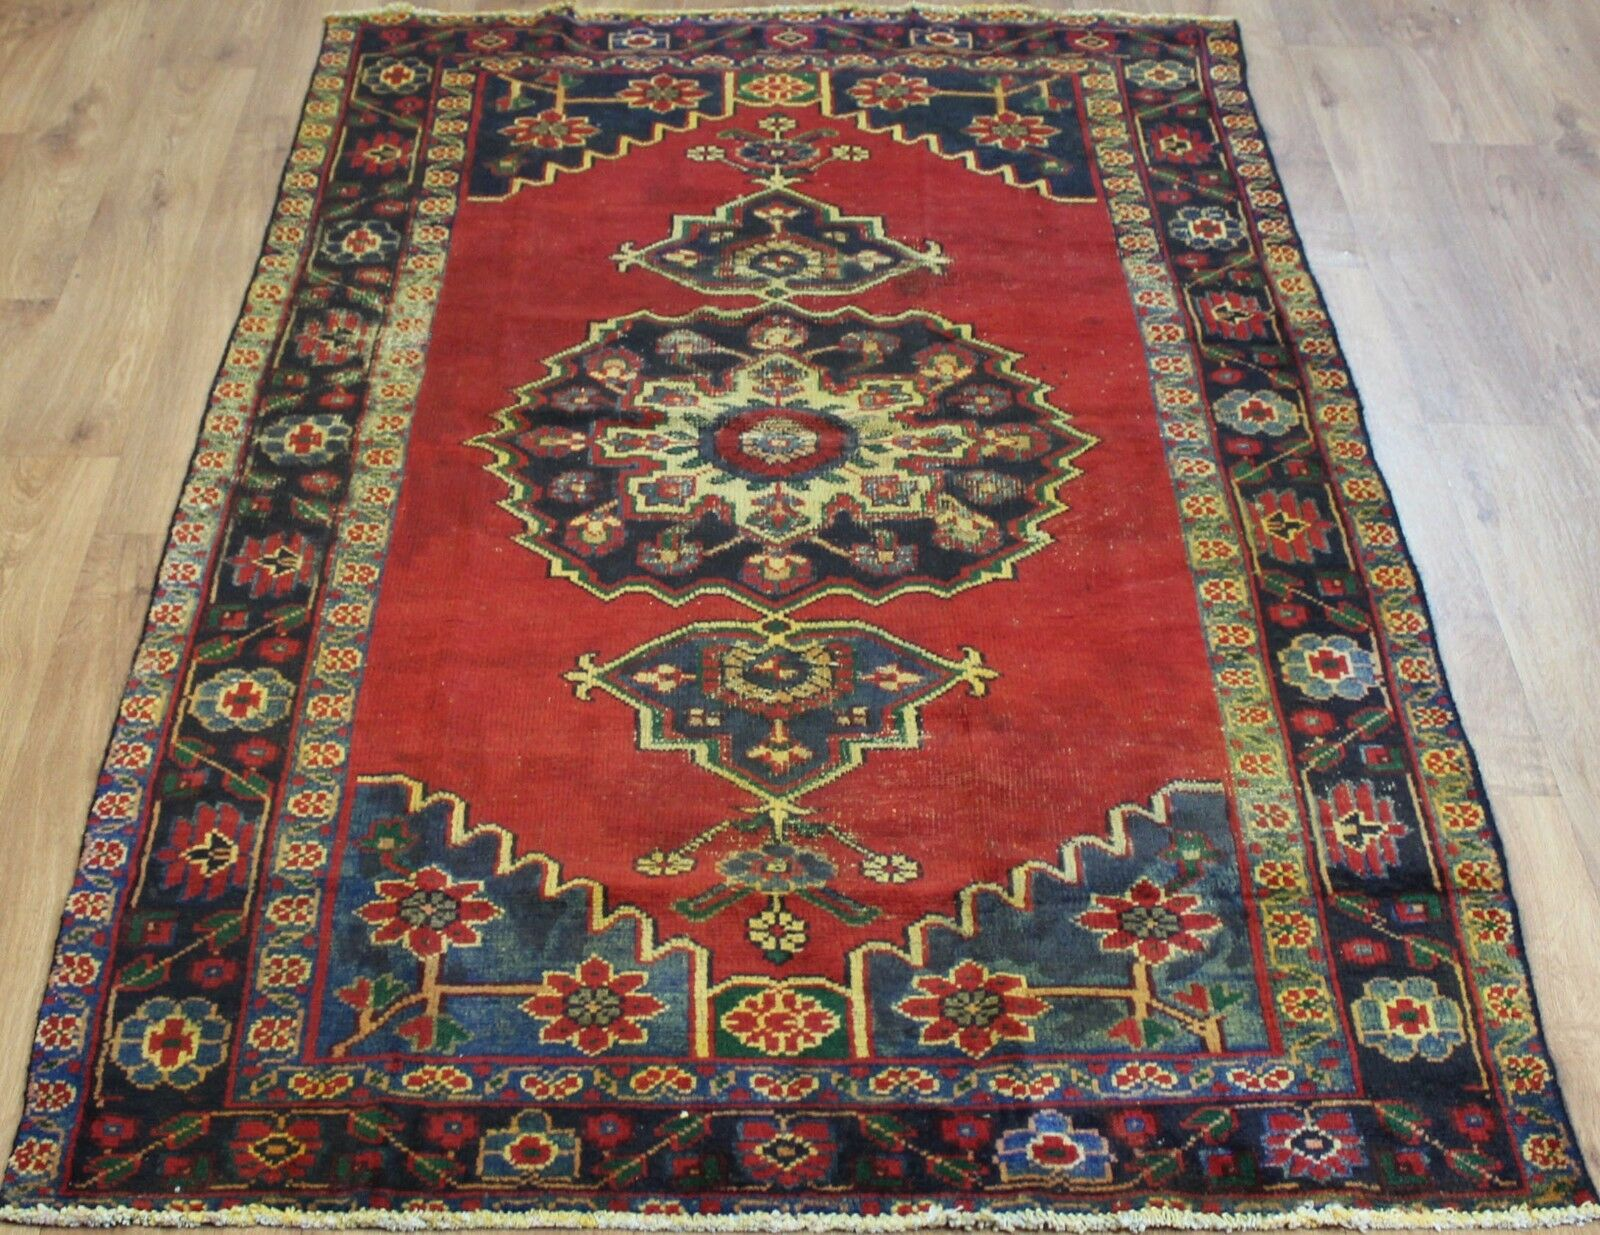 Persiano Tradizionale Lana Vintage 227cmX128cm Tappeto orientale orientale orientale fatto a mano Carpet Rugs fd081c